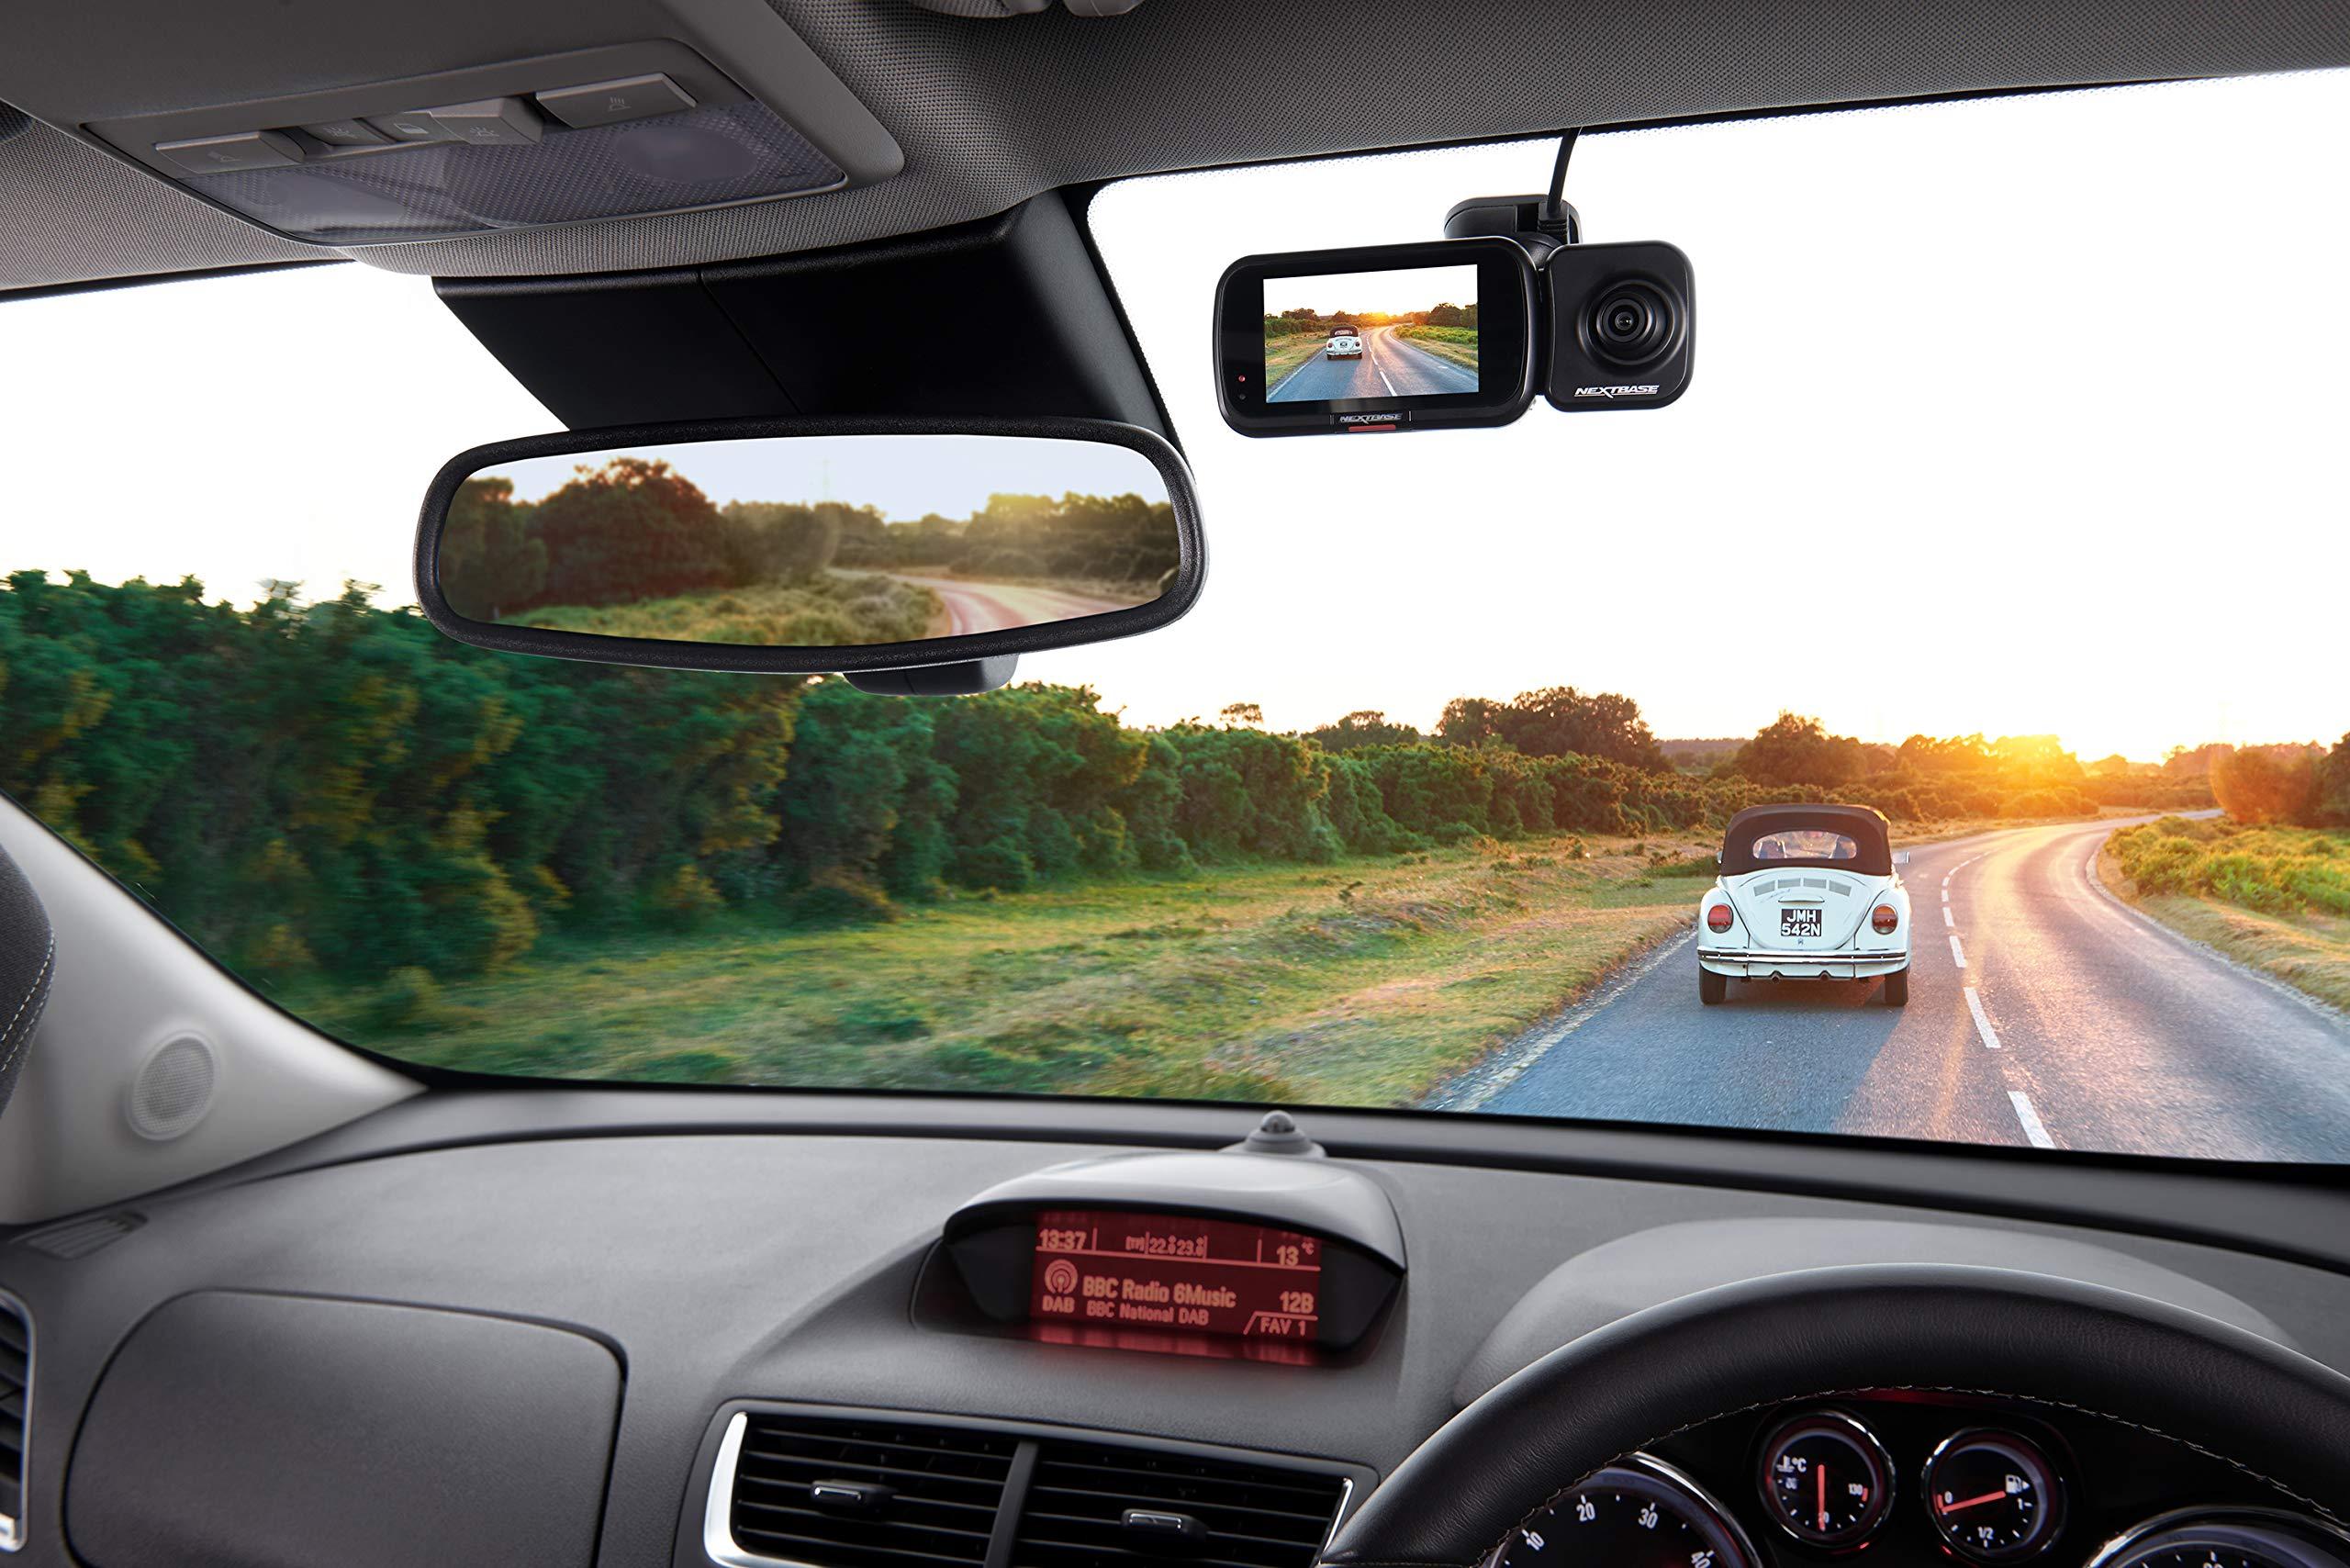 Nextbase-Dash-Cam-Rear-Facing-Camera-Zoom-322422522622-Rear-View